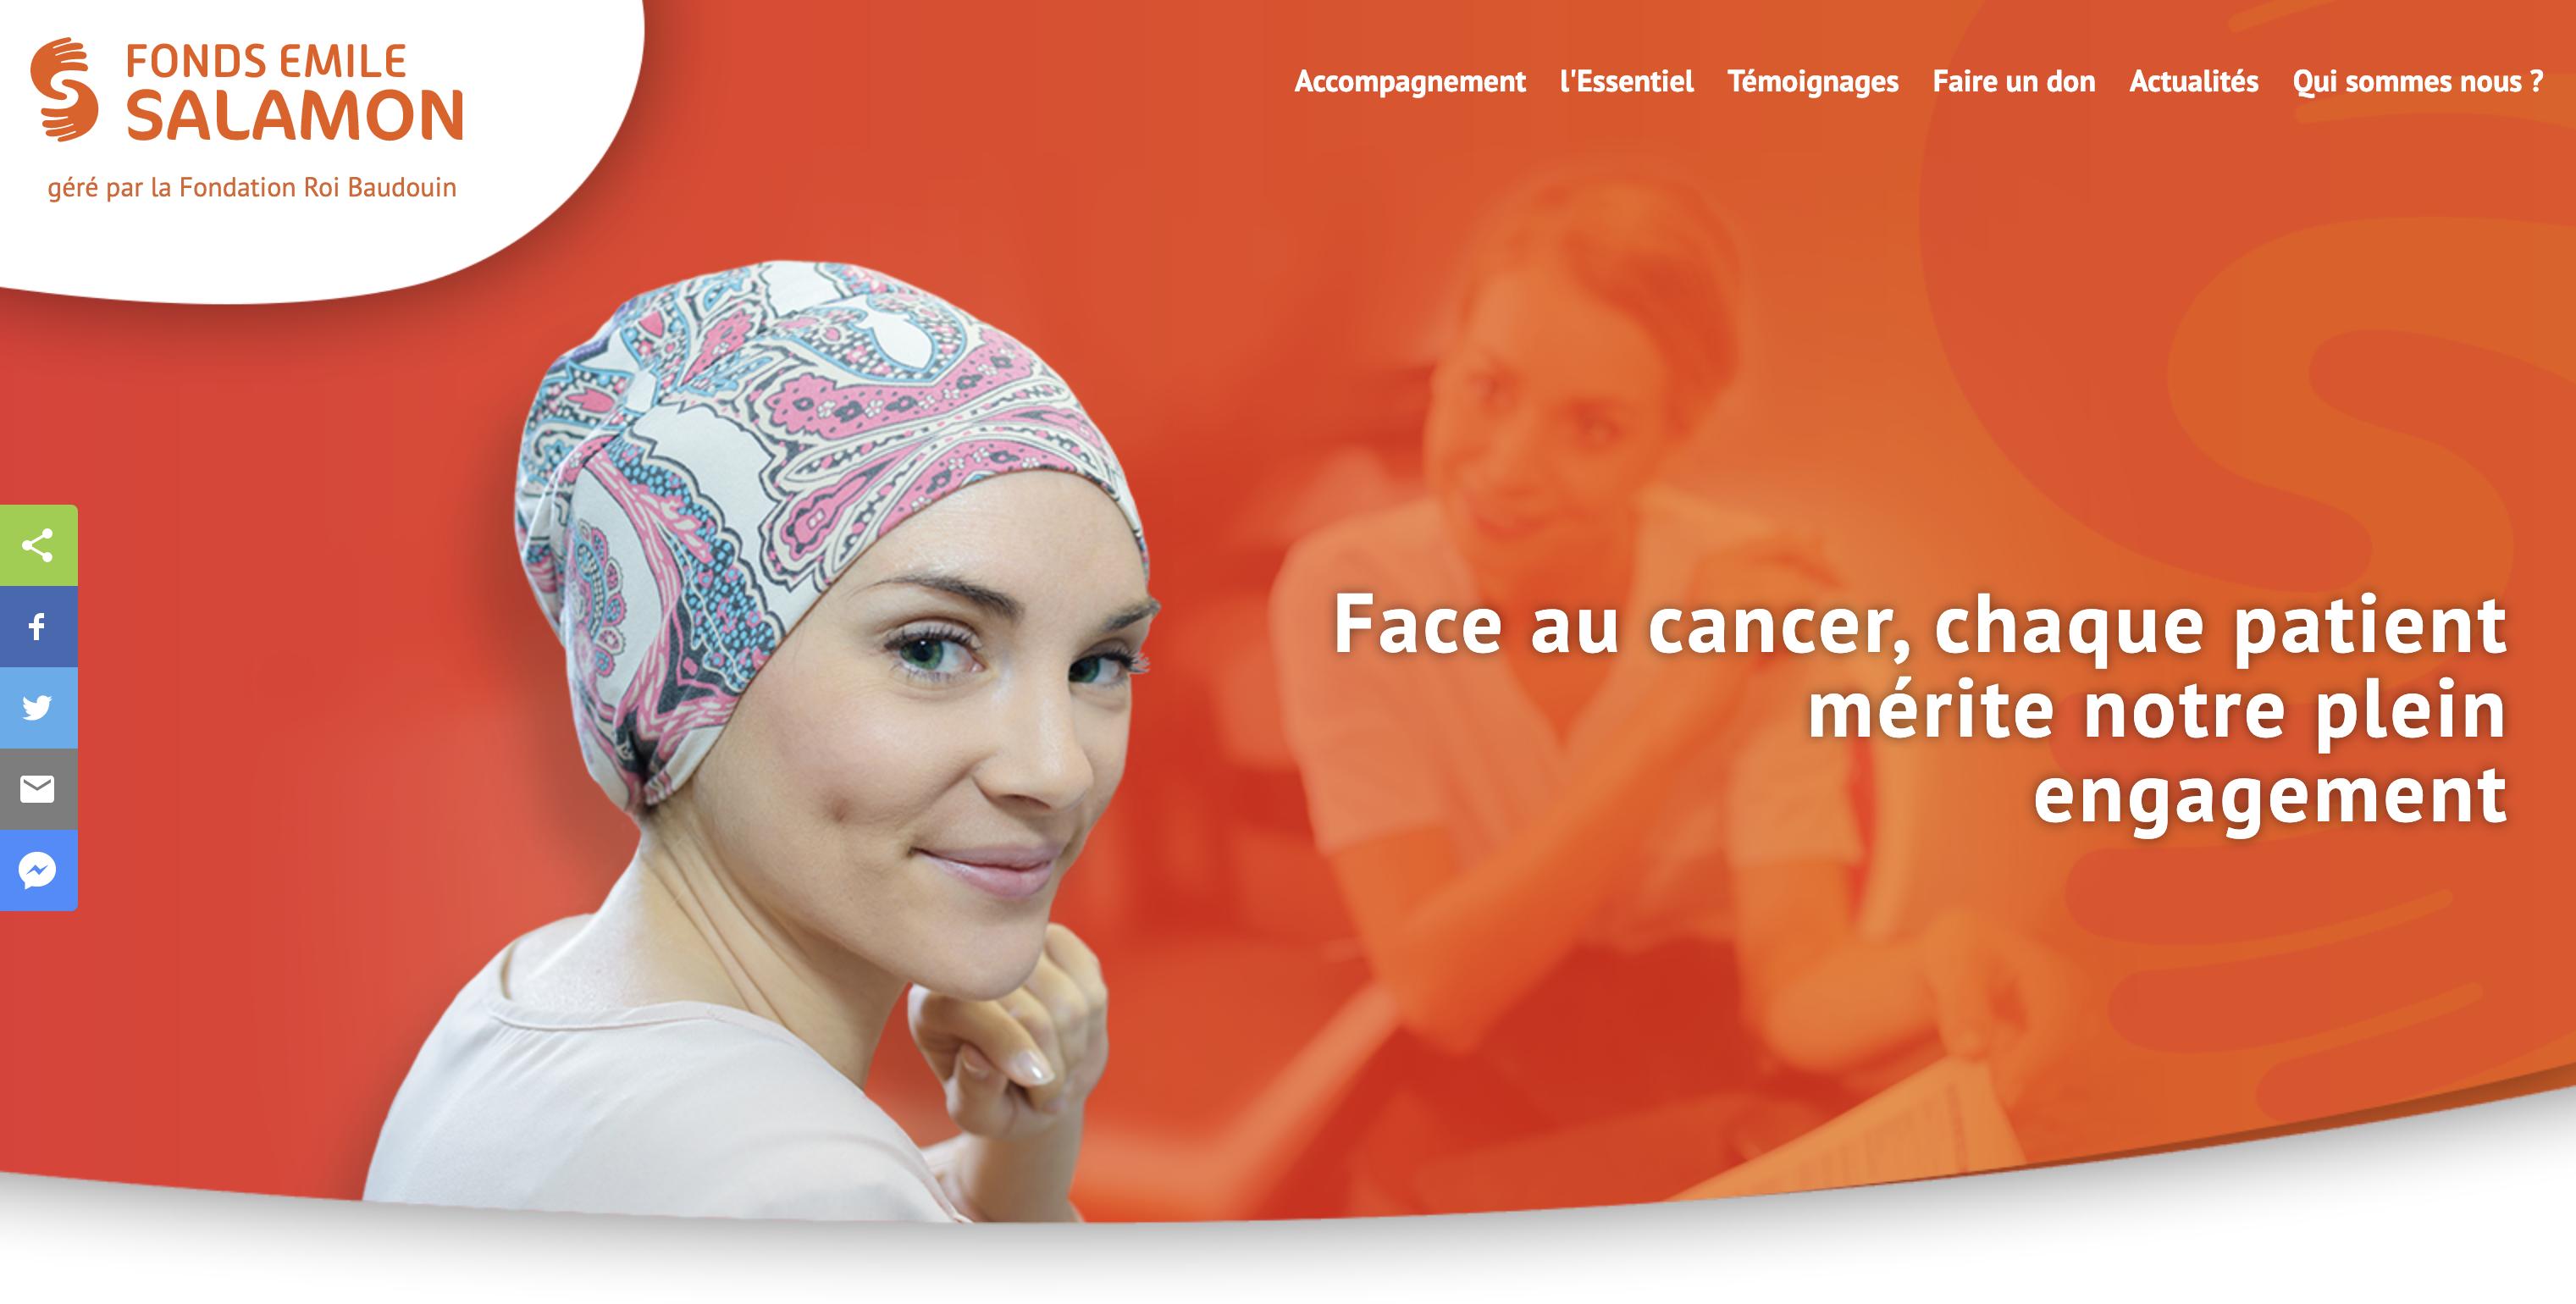 Fonds Emile Salamon - 2019